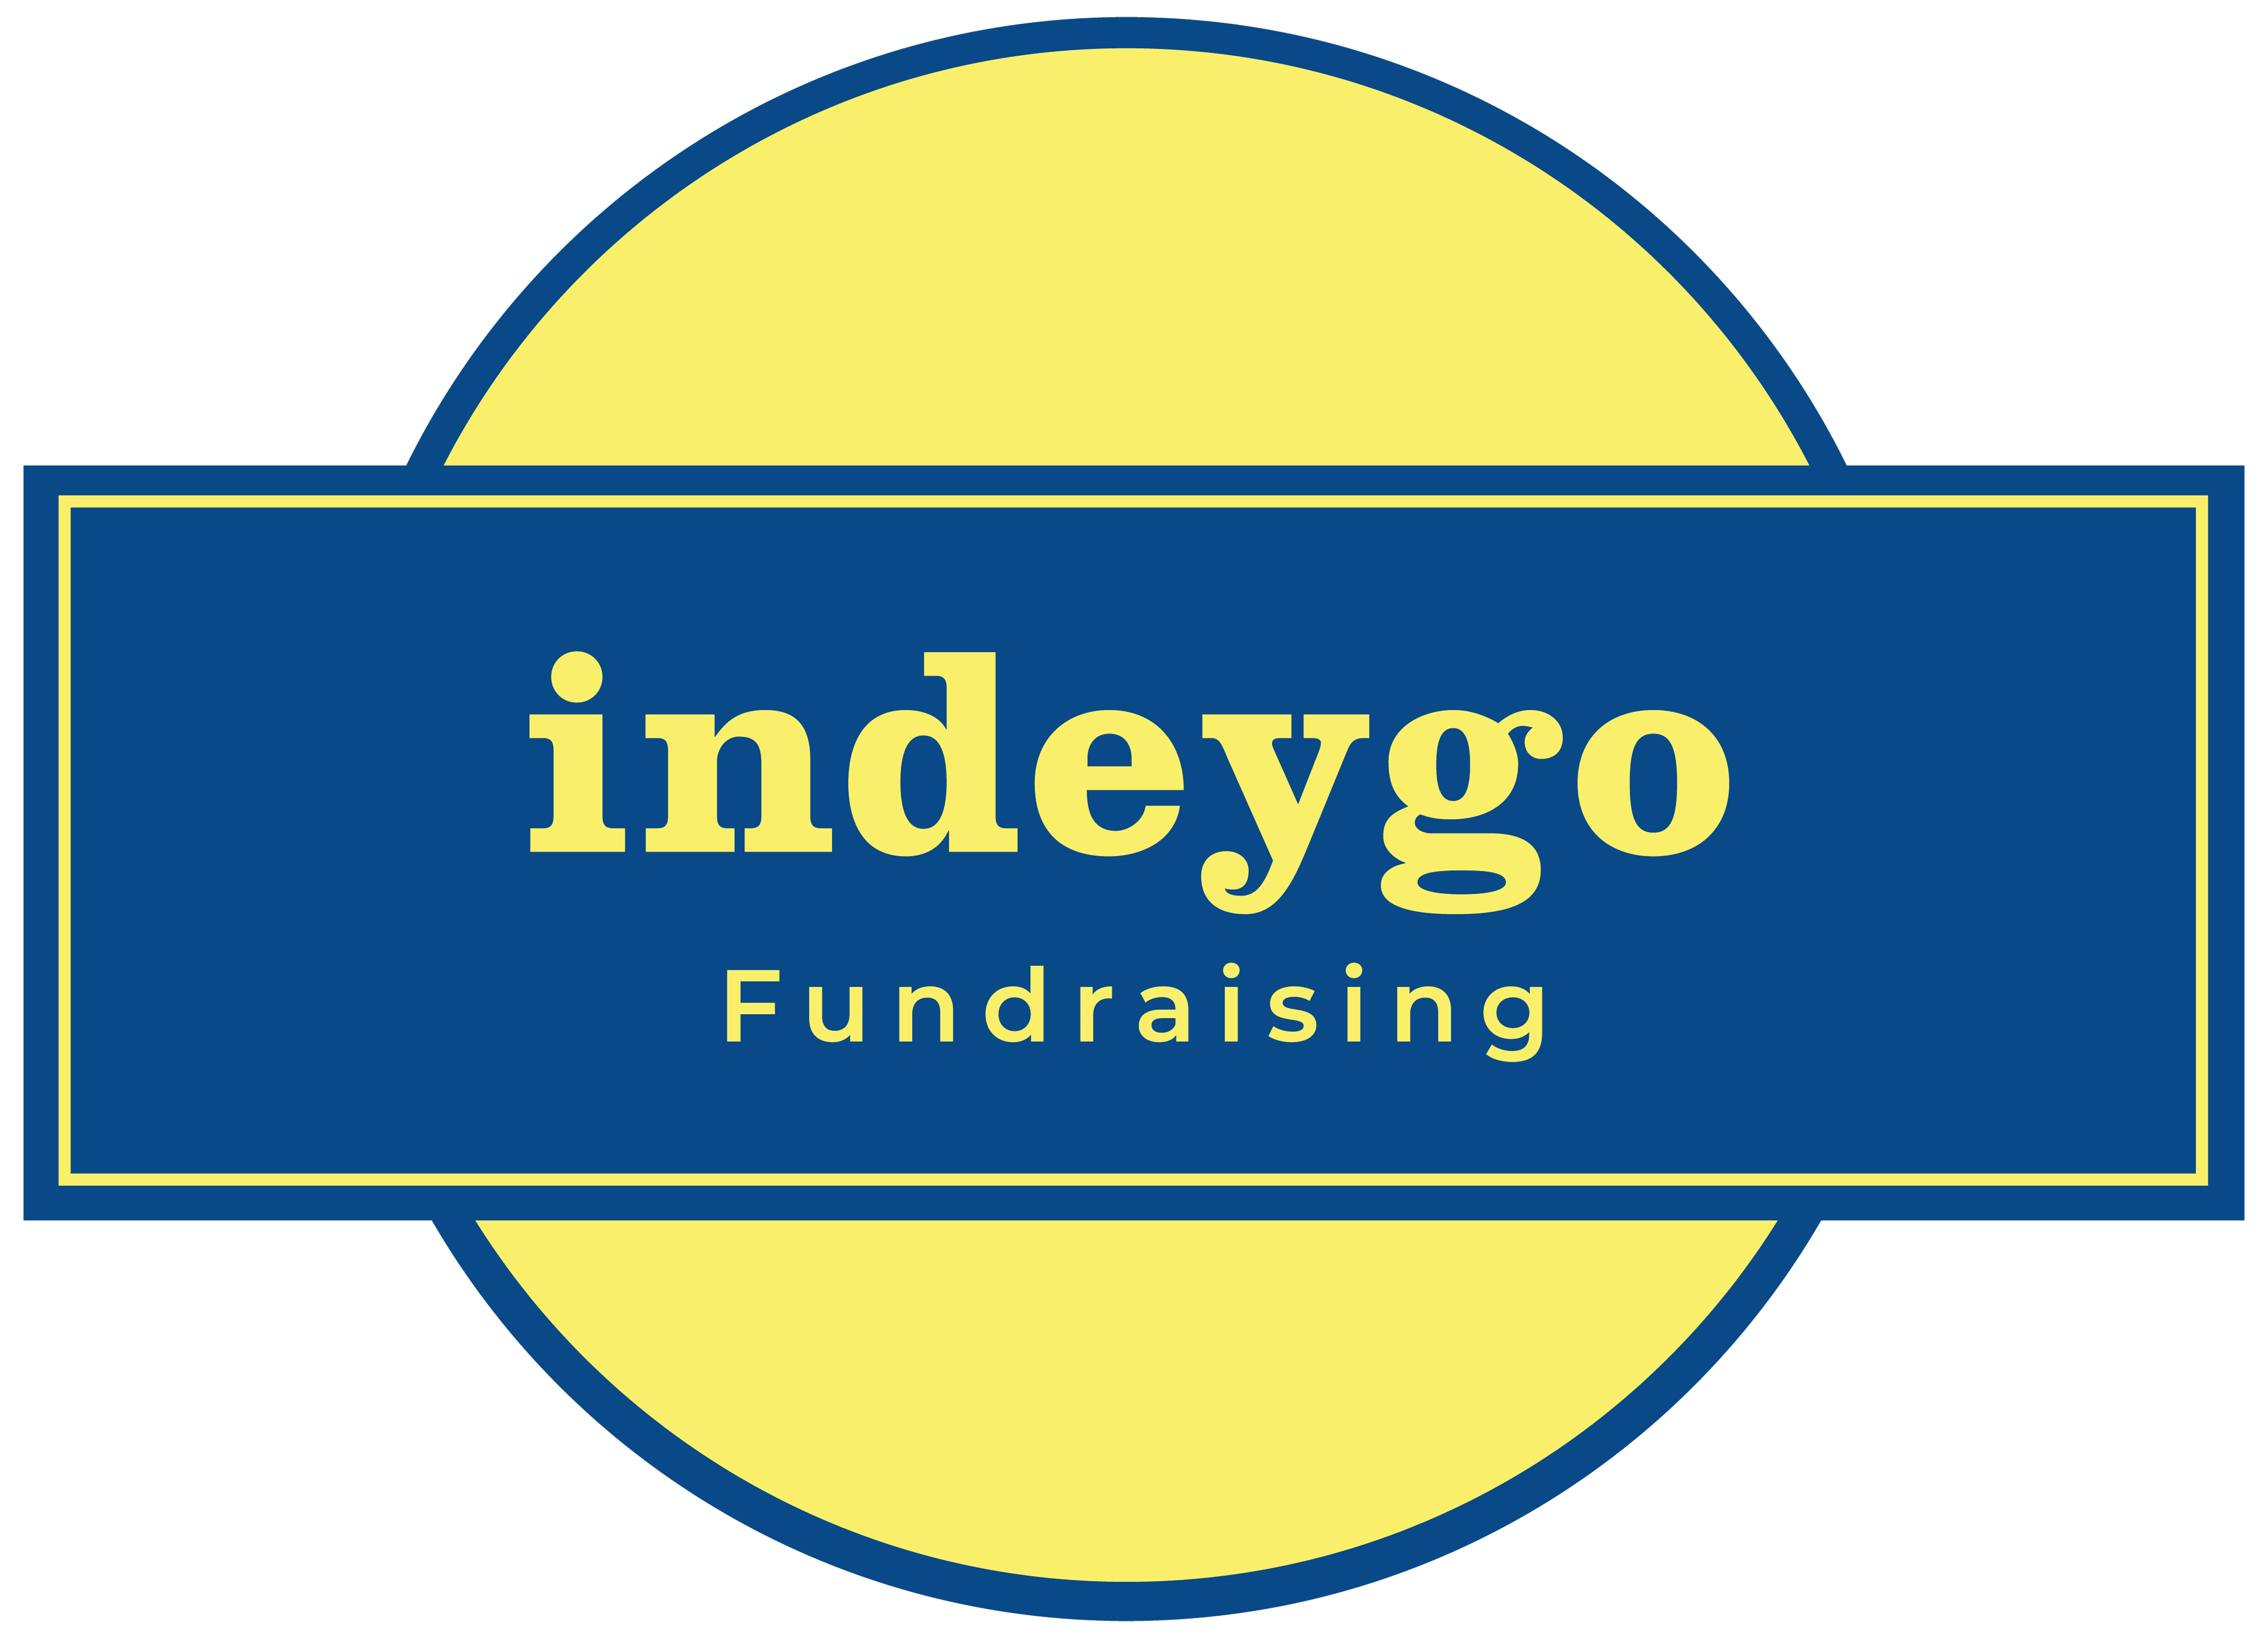 Indeygo Fundraising